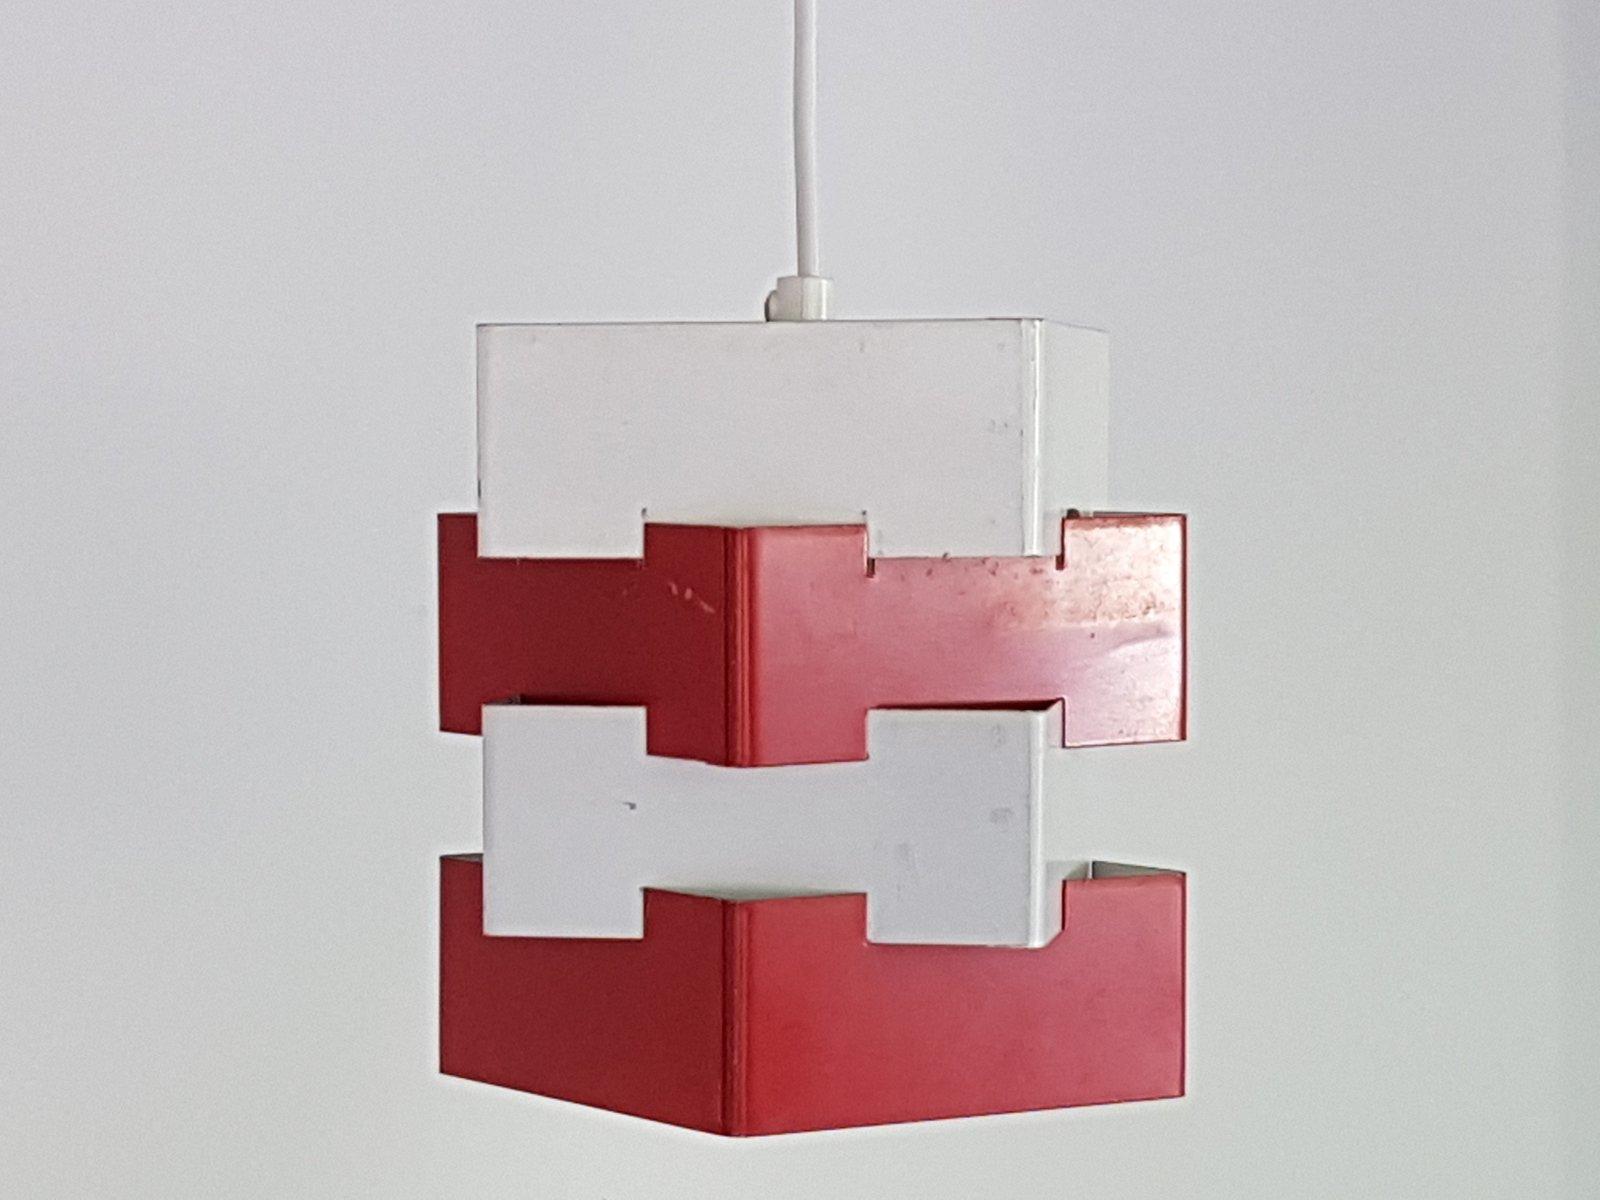 schwedische metall h ngelampen in wei rot von kronobergs belysning 1960er 2er set bei. Black Bedroom Furniture Sets. Home Design Ideas